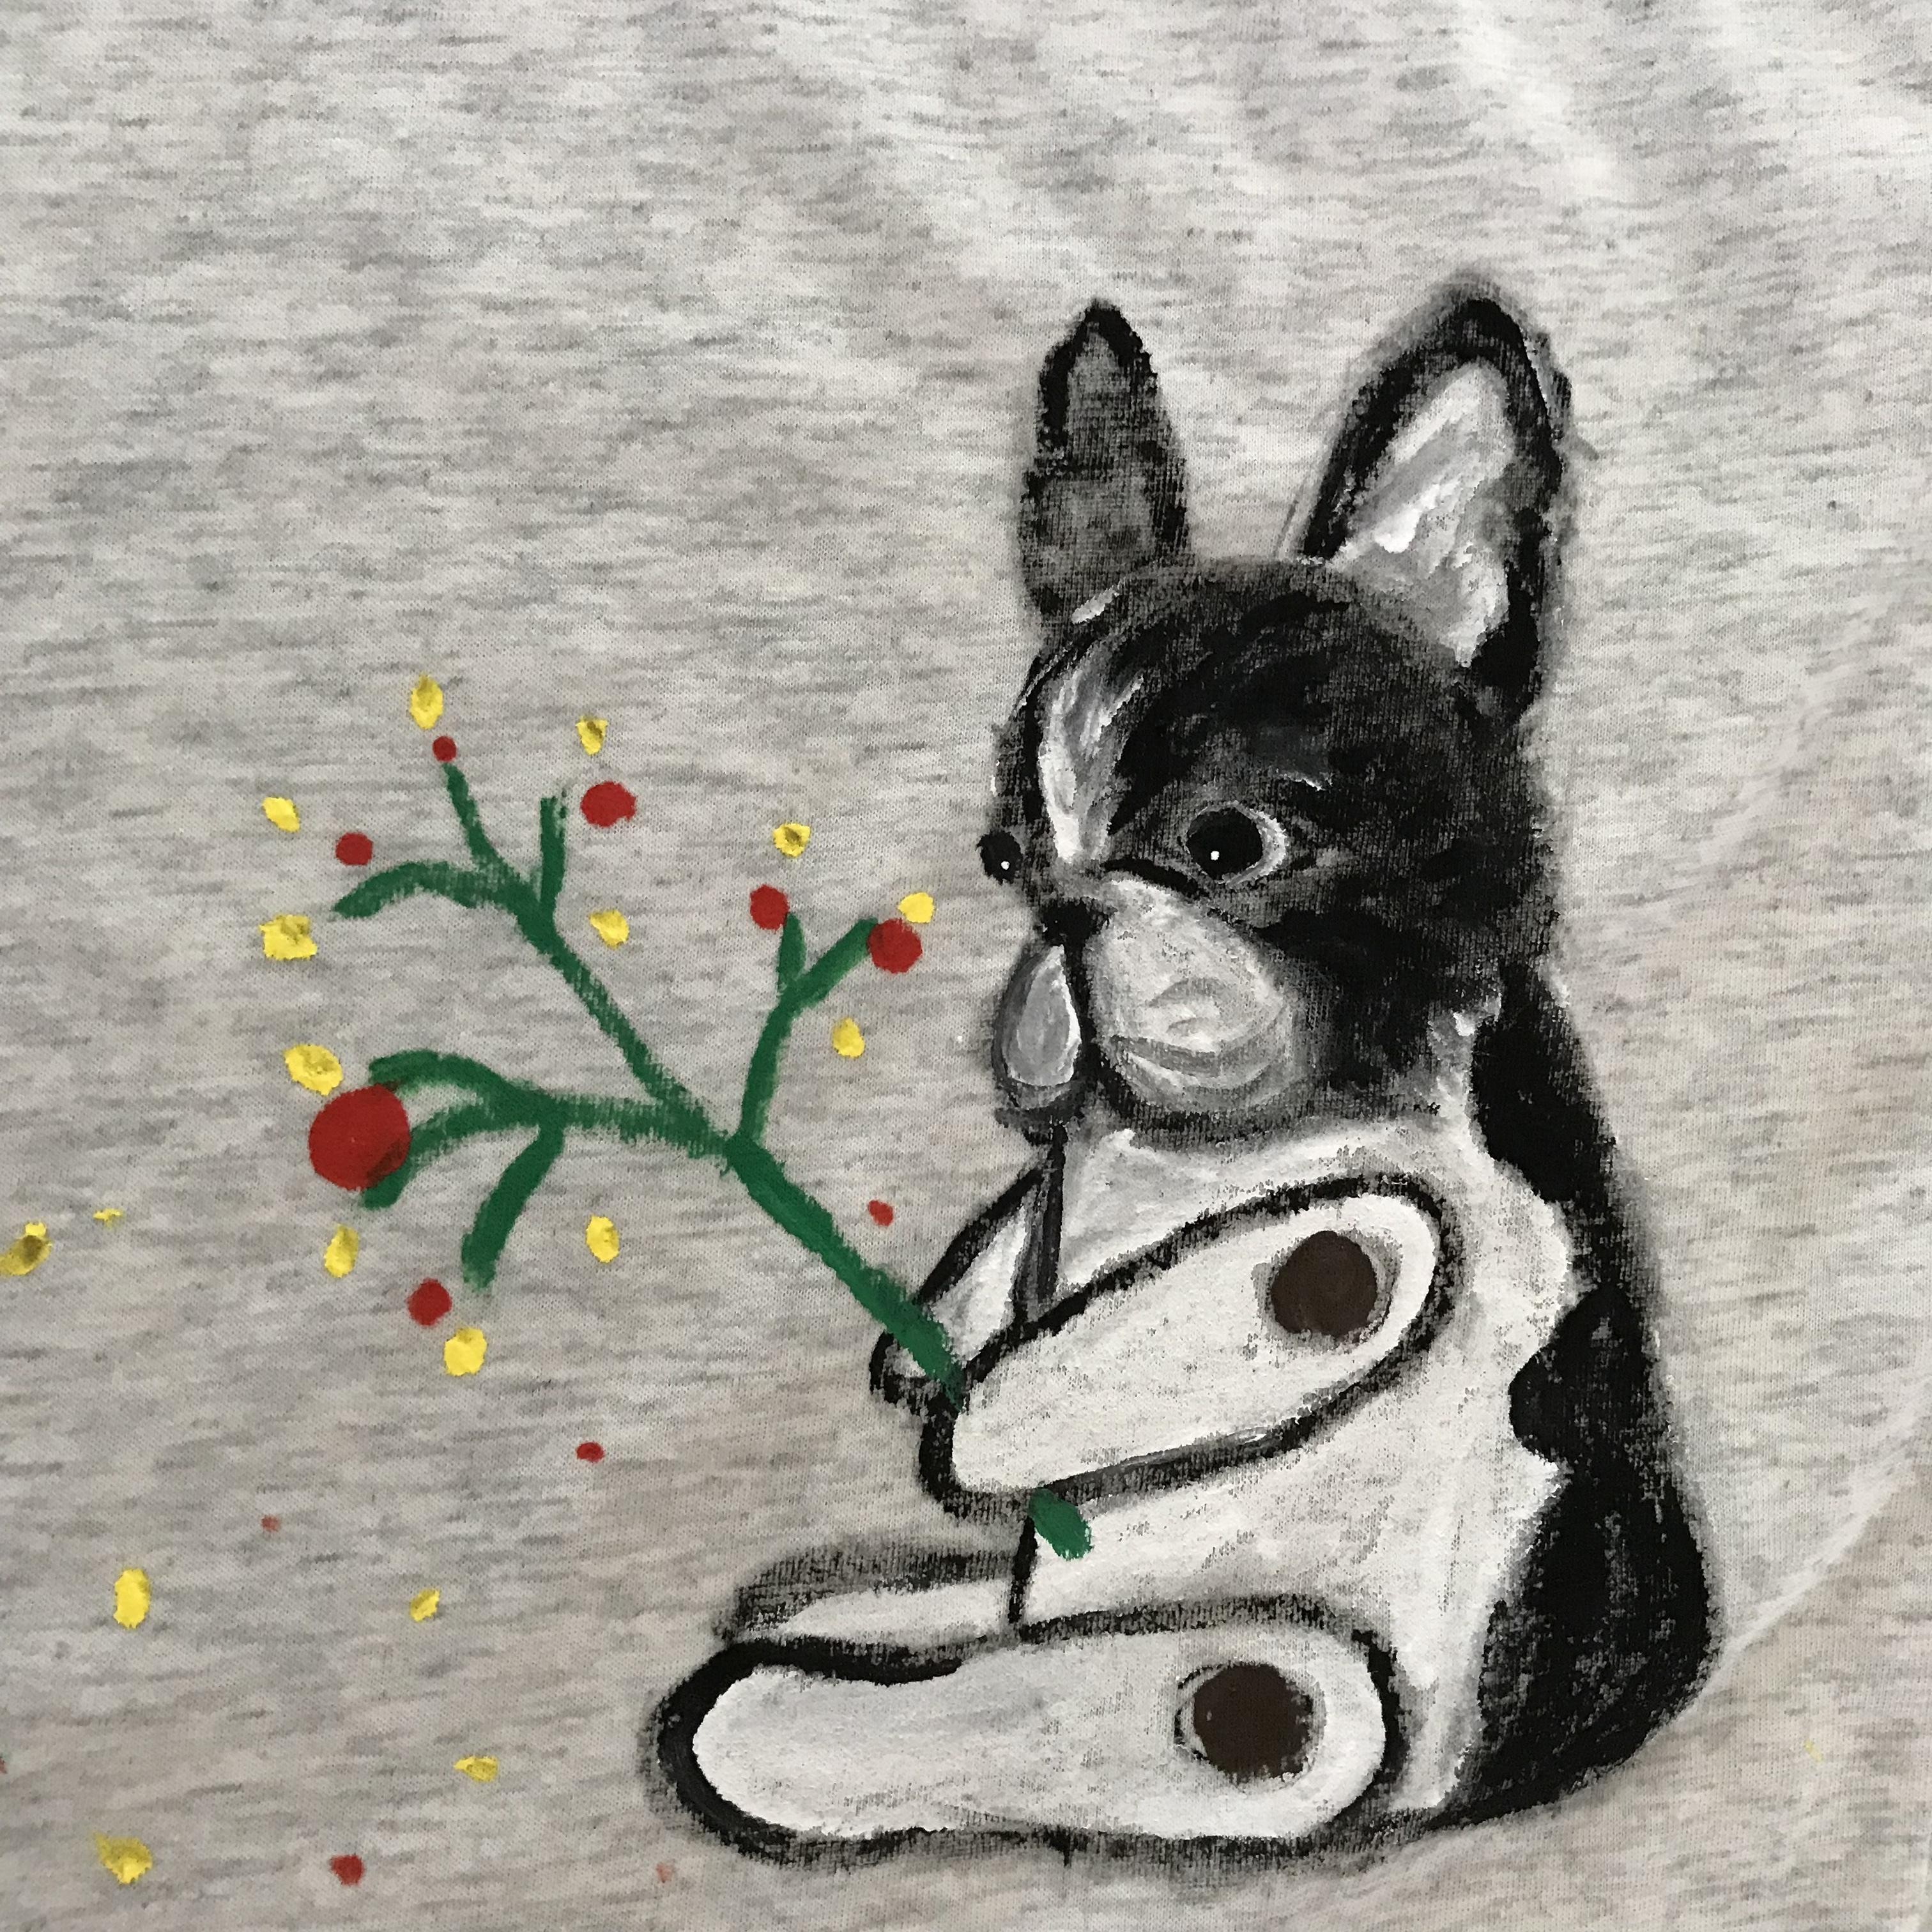 BUHIお絵描きTシャツ(レディースL)ロボット・オートミル